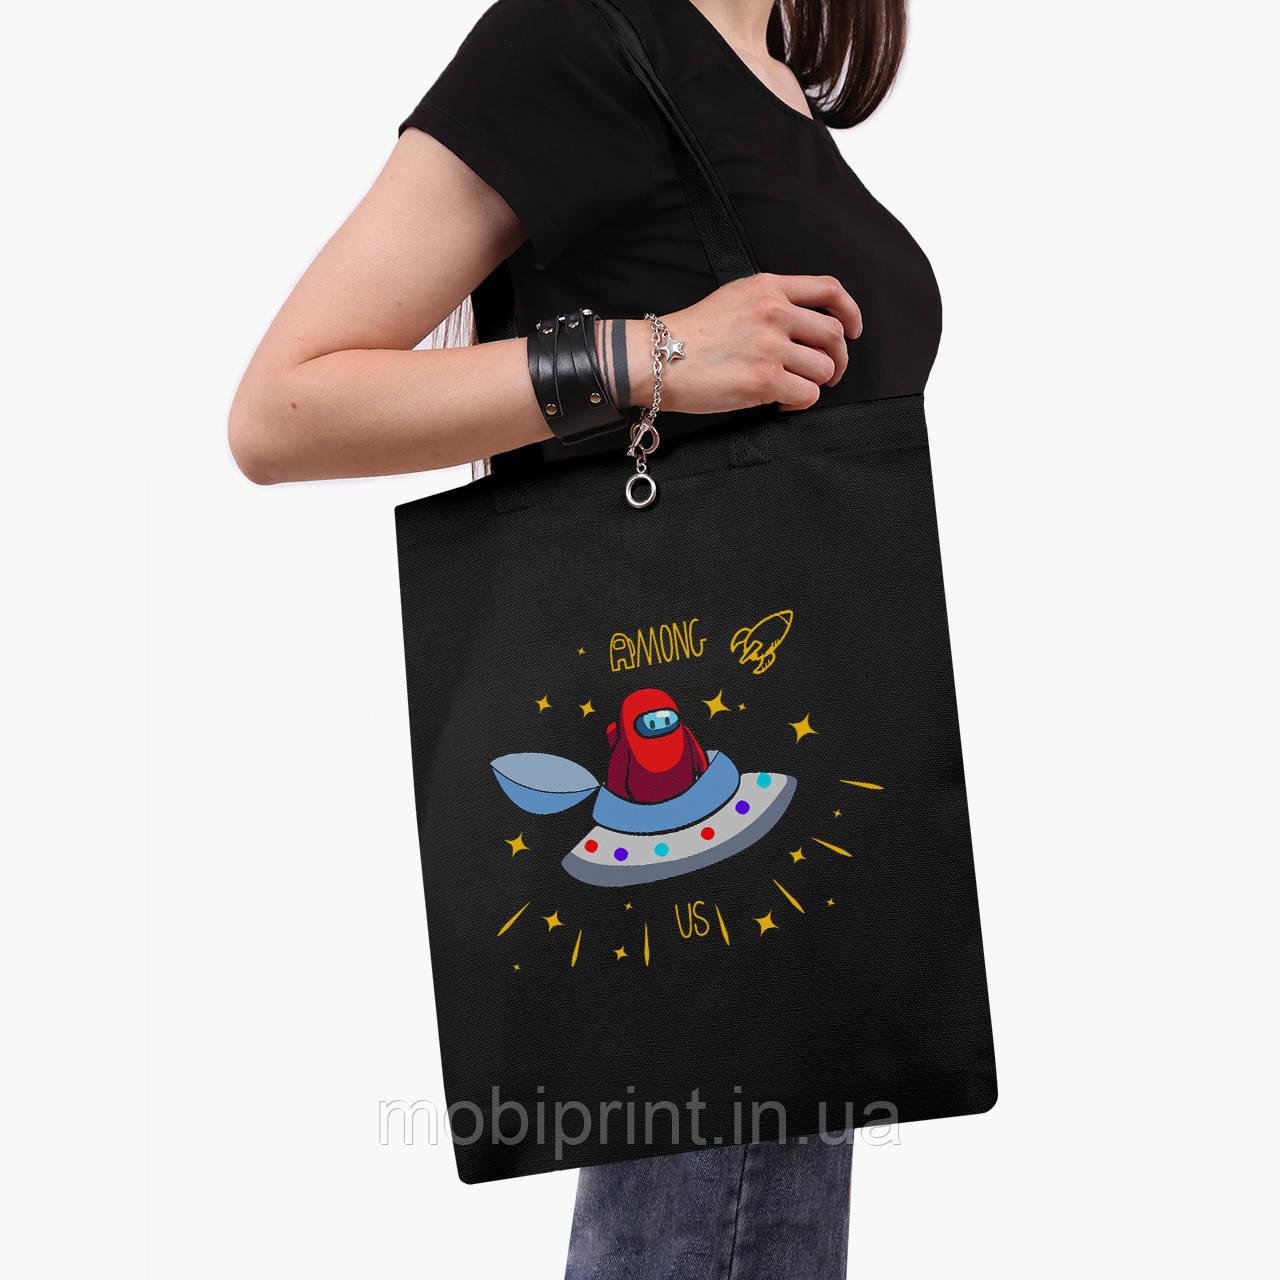 Еко сумка шоппер чорна Амонг Ас (Among Us) (9227-2583-2) 41*35 см